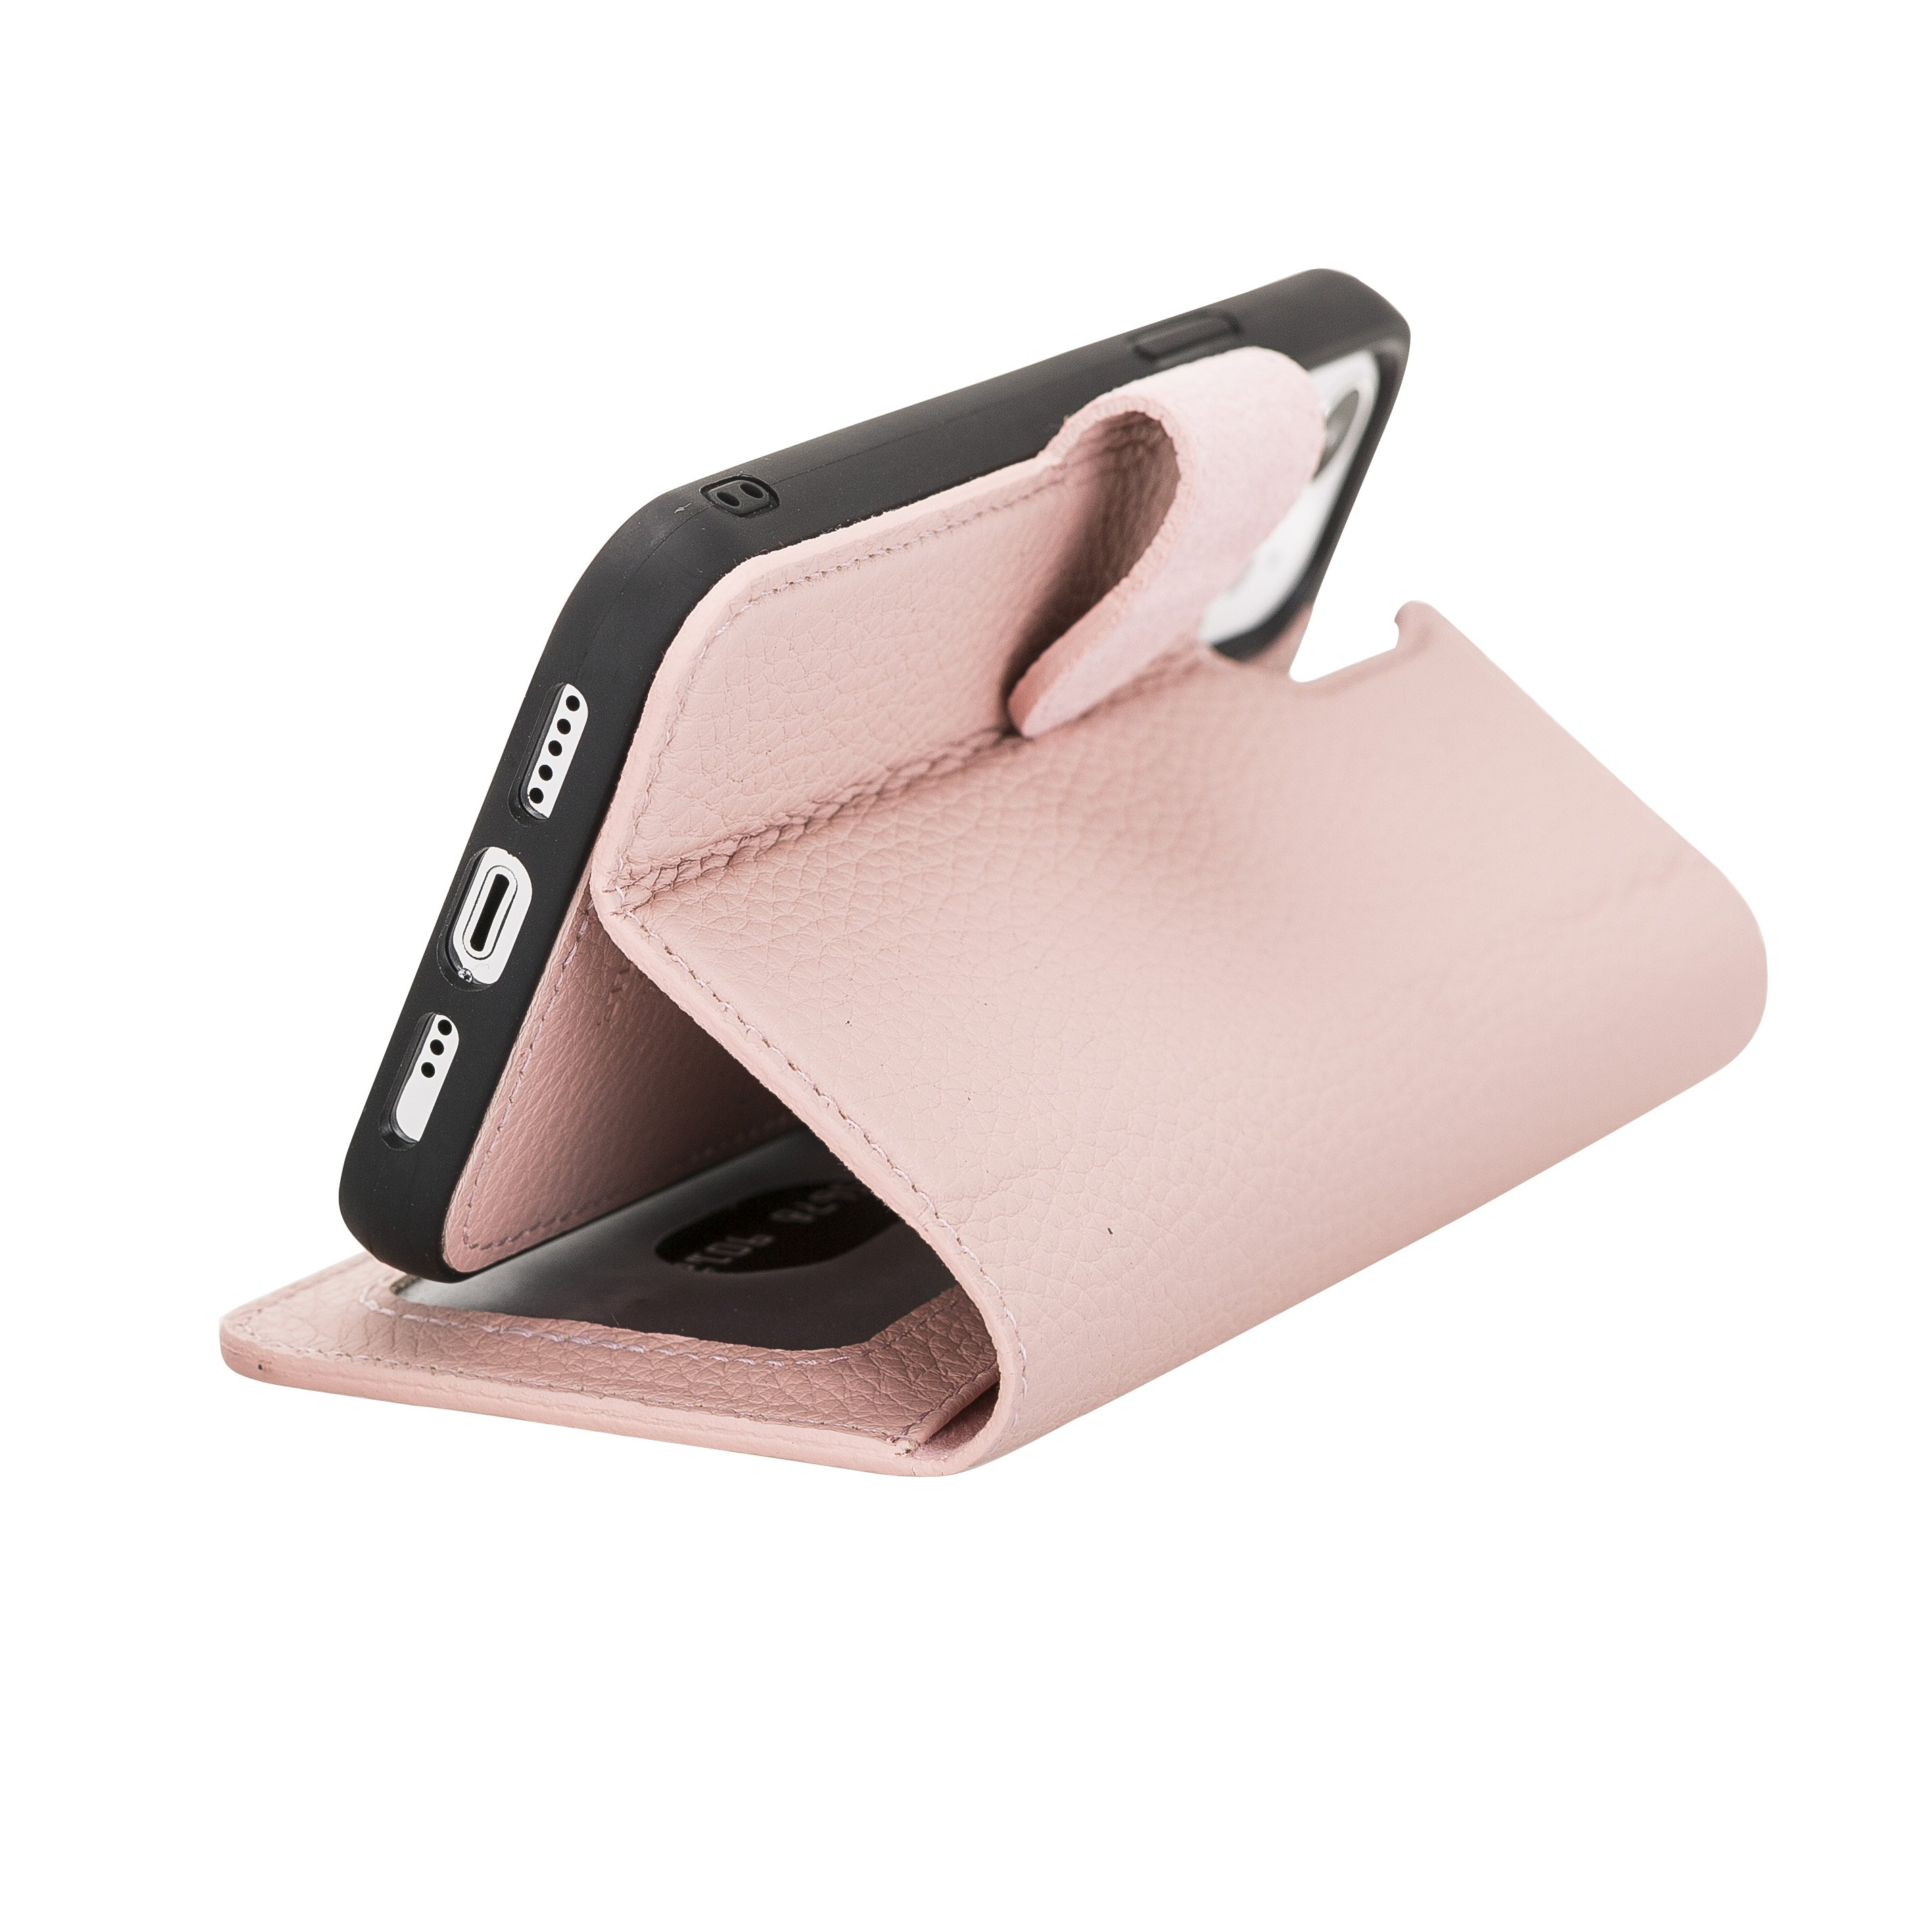 "iPhone 12 Pro Max abnehmbare Lederhülle ""Harvard"" MagSafe kompatibel (Nude Rosa)"